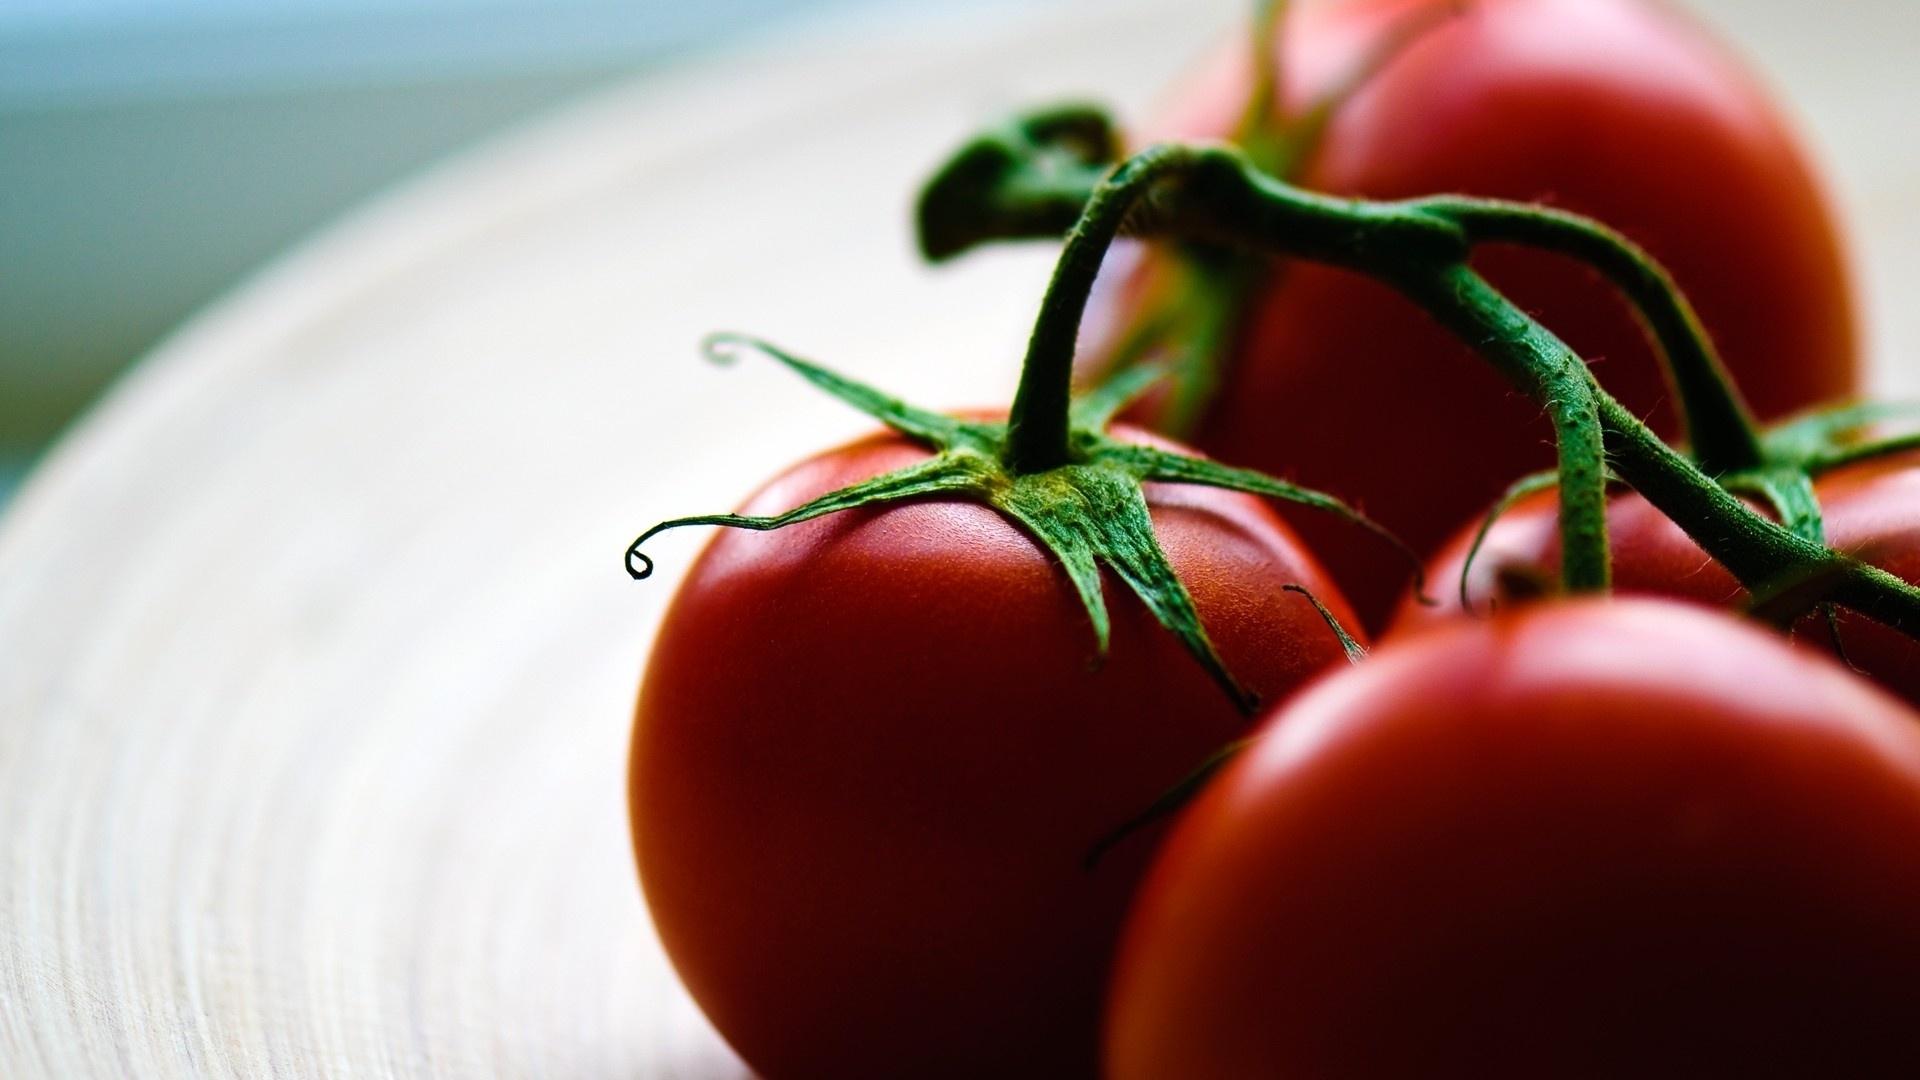 Tomatoes PC Wallpaper HD